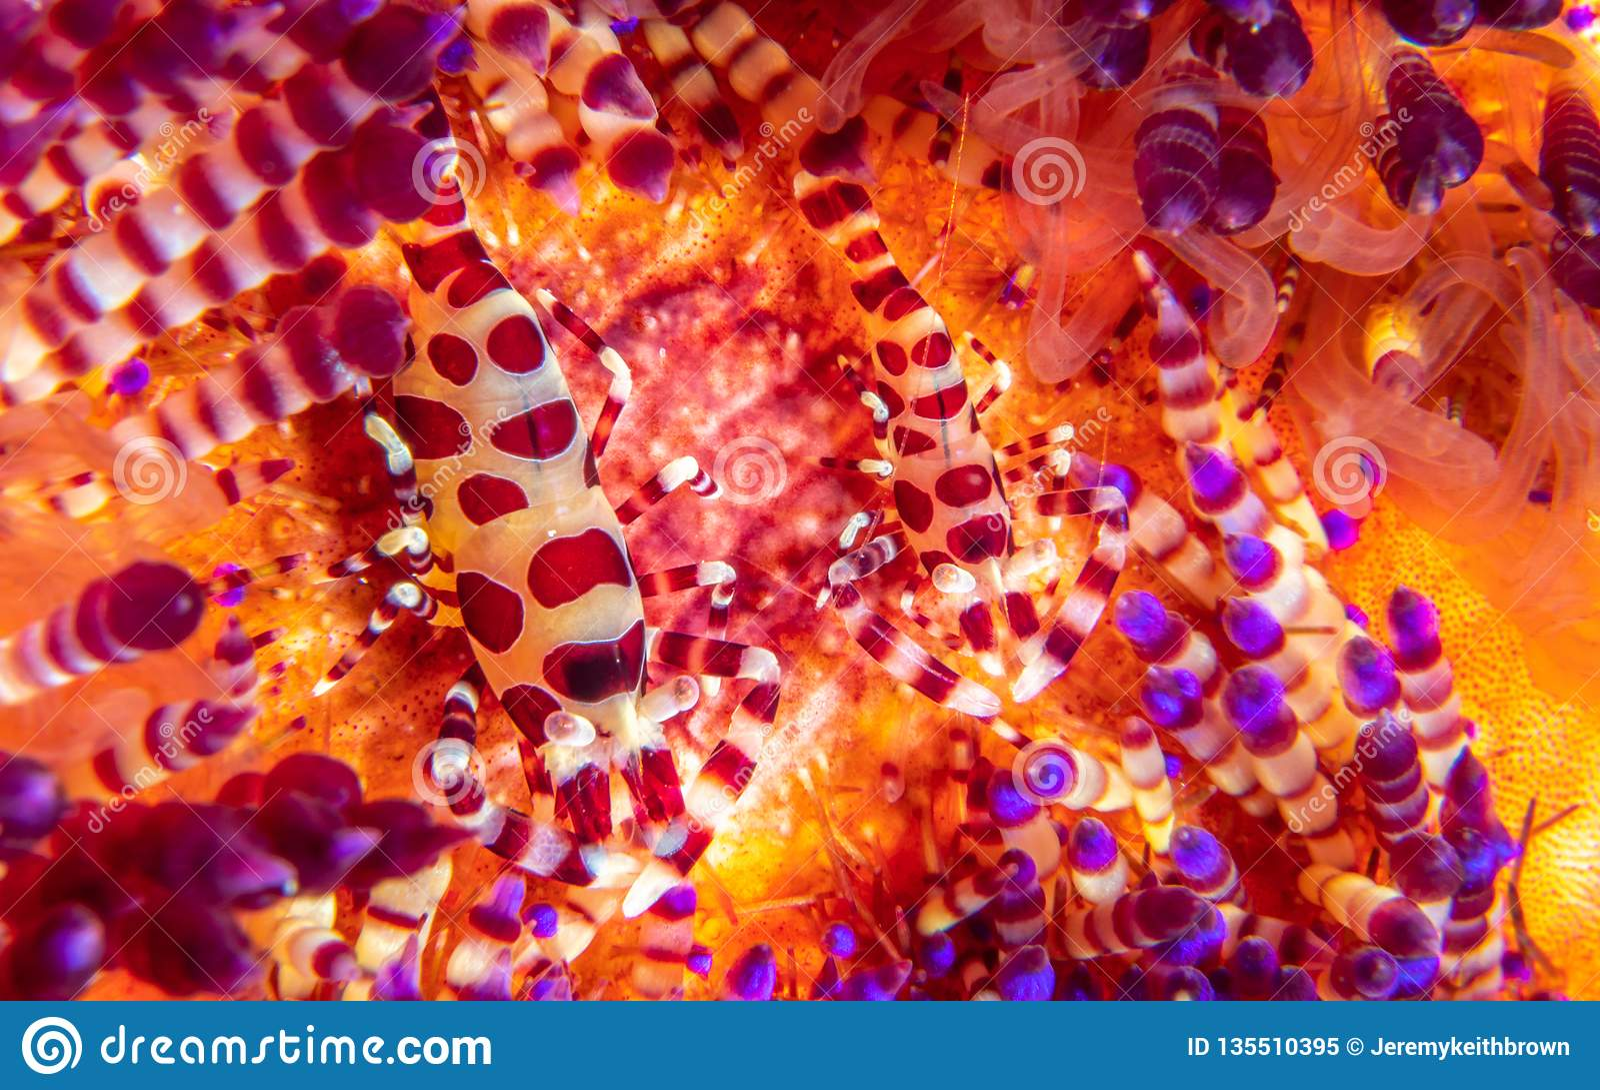 科尔曼虾,Periclimenes colemani,在火野孩子,Astropyga radiata